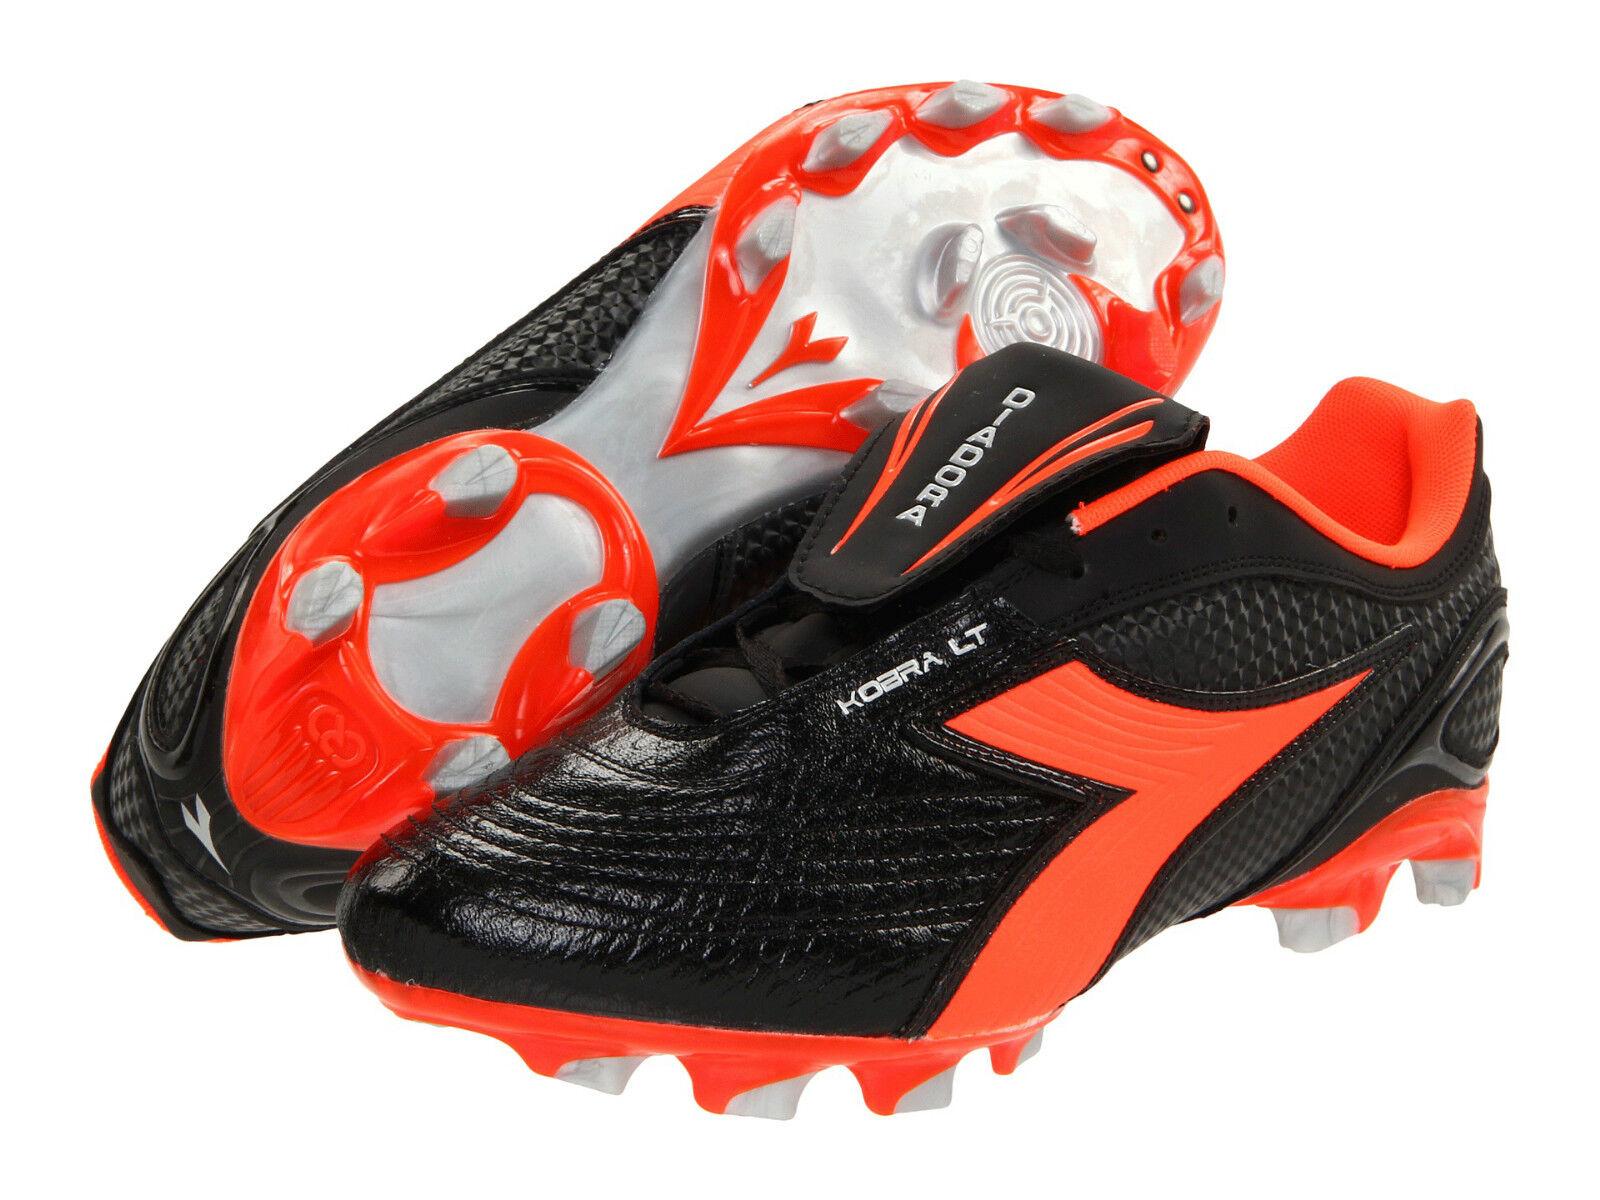 NIB NEW   Diadora Kobra Plus LT BX 14 Soccer Cleats  MEN'S PRO CLEATS